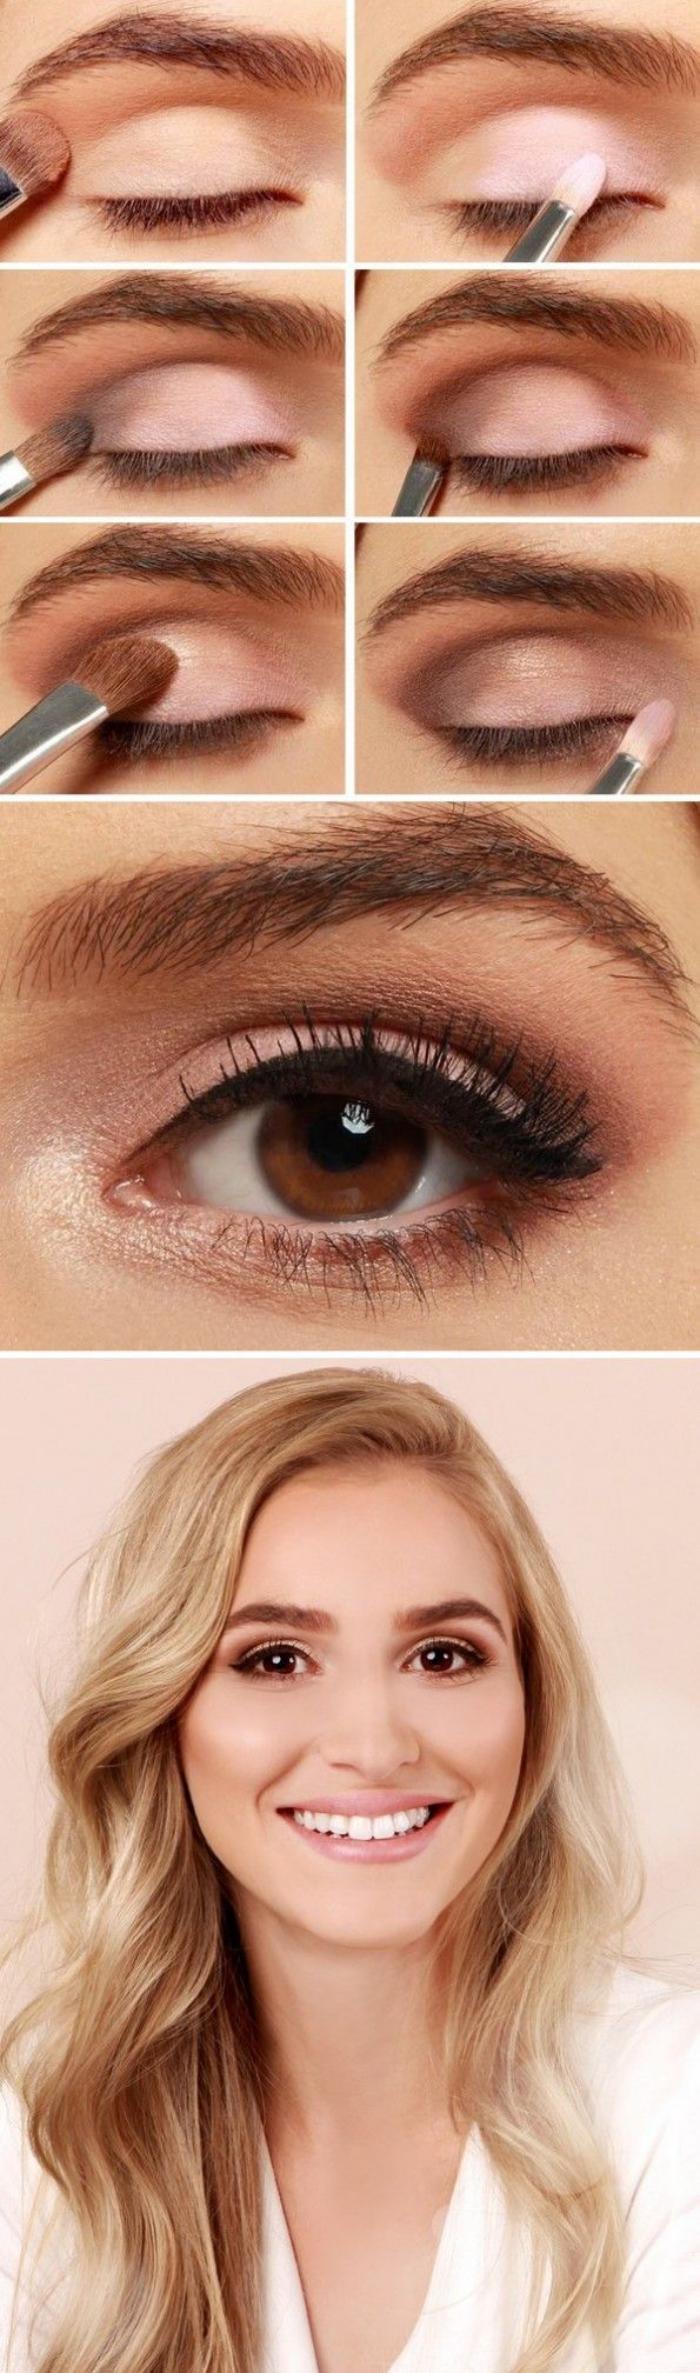 Maquillage yeux marrons facile fashion designs - Maquillage araignee facile ...